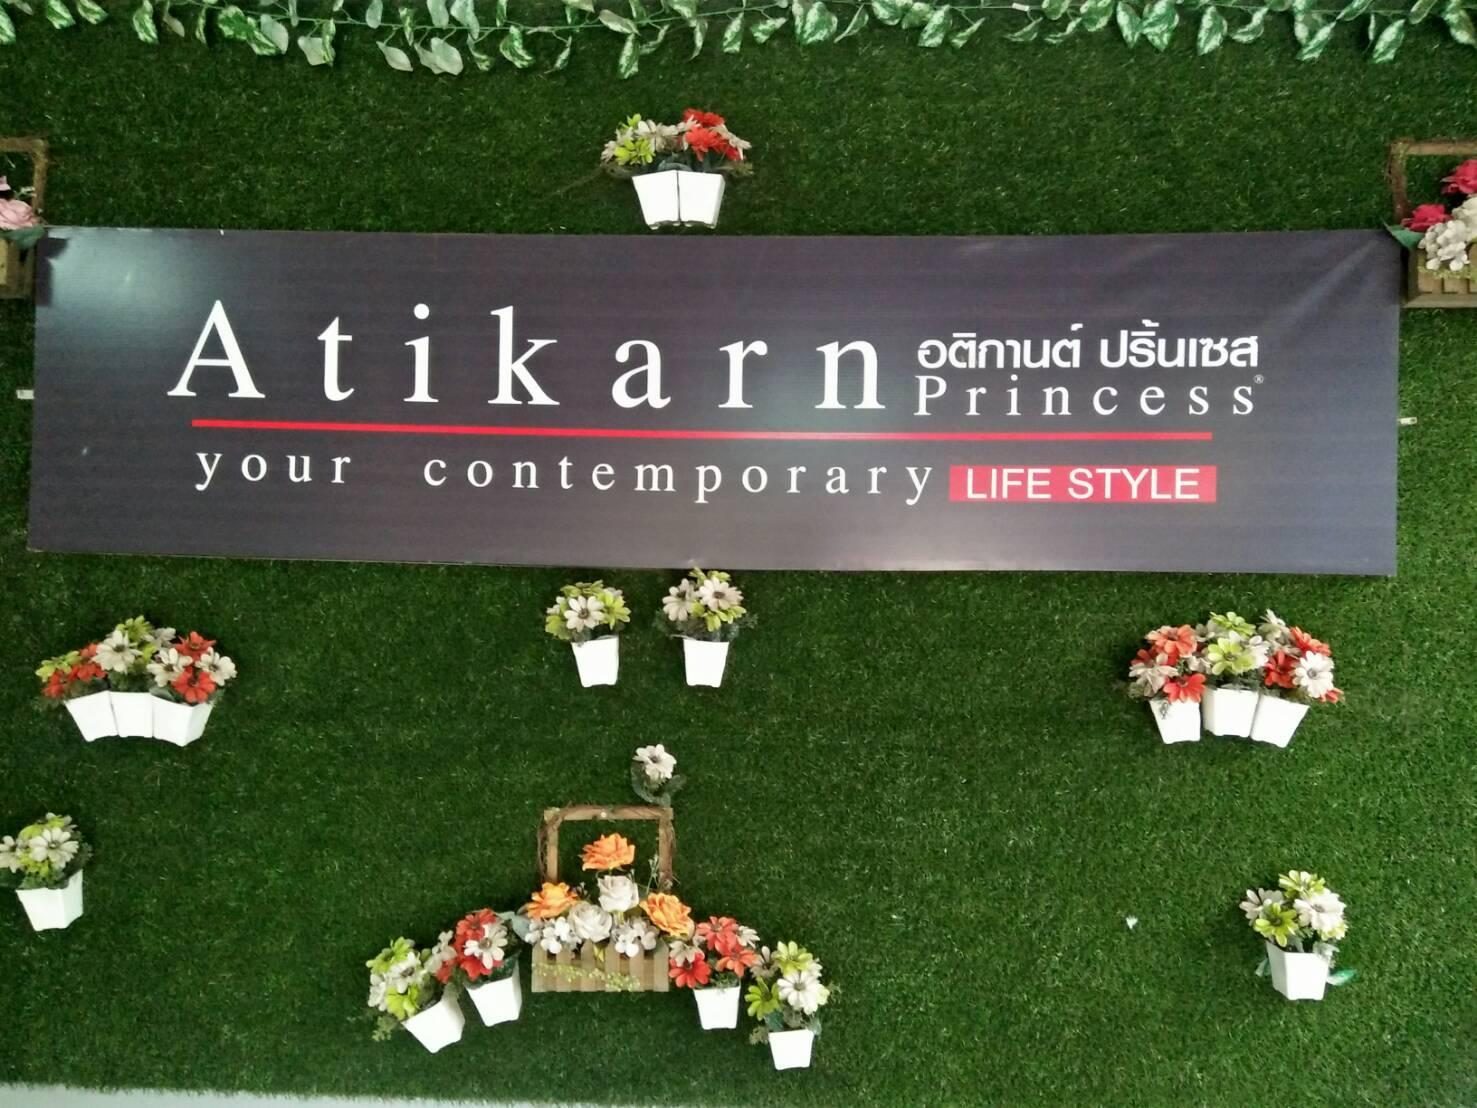 Atikarn Princess Hotel & Resort, Muang Udon Thani